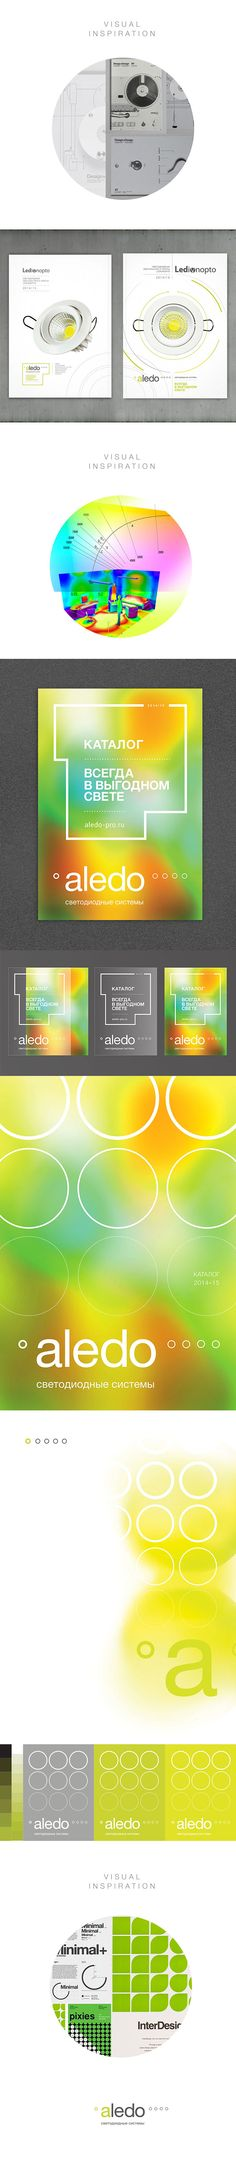 aledo cover | design process on Behance